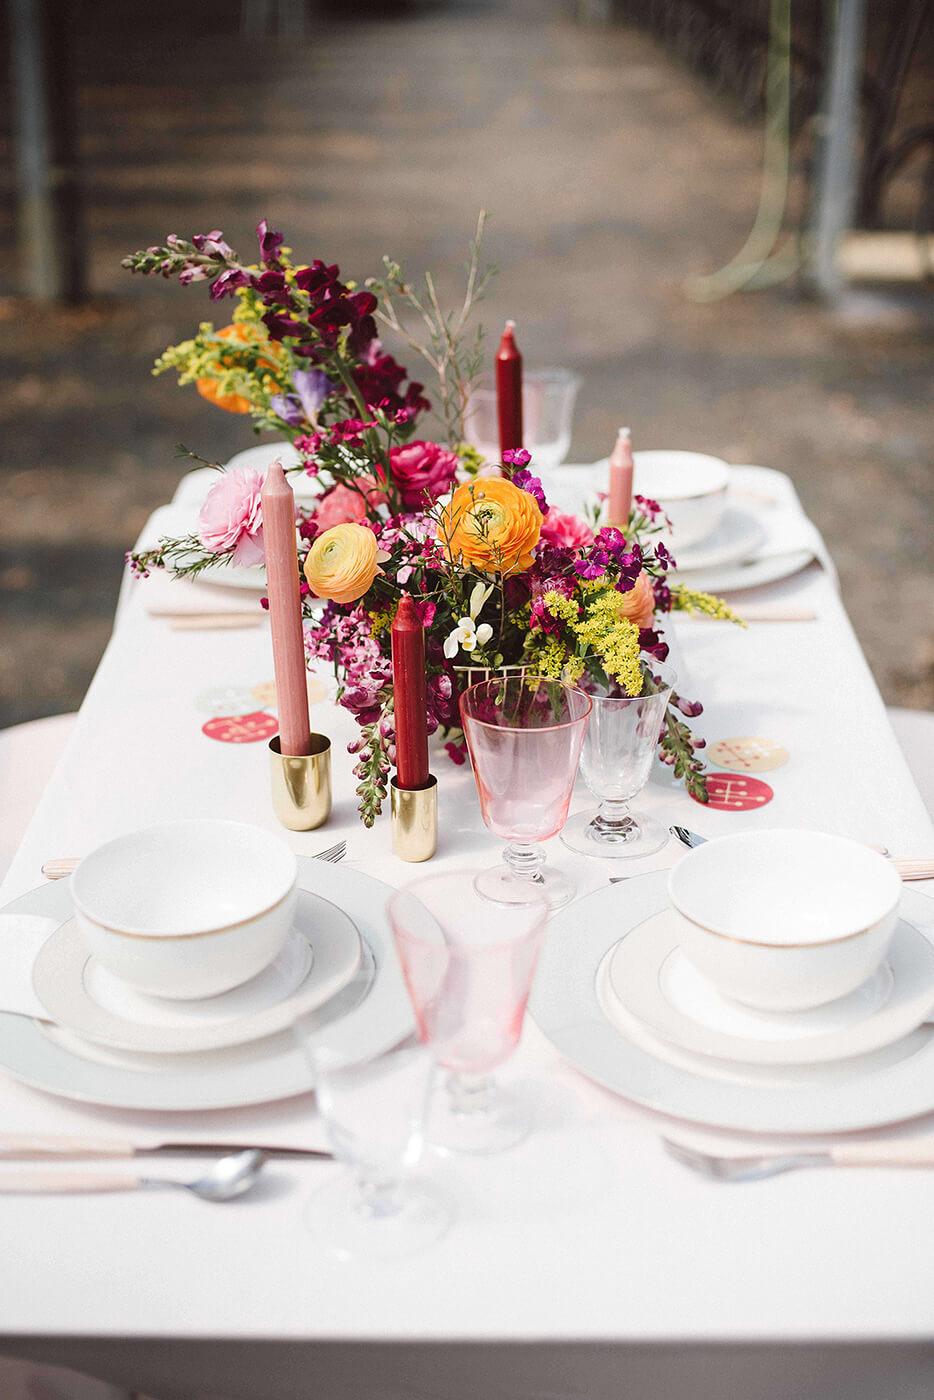 roma-organizacao-eventos-editorial-mid-century-modern-wedding-in-a-strawberry-field-05